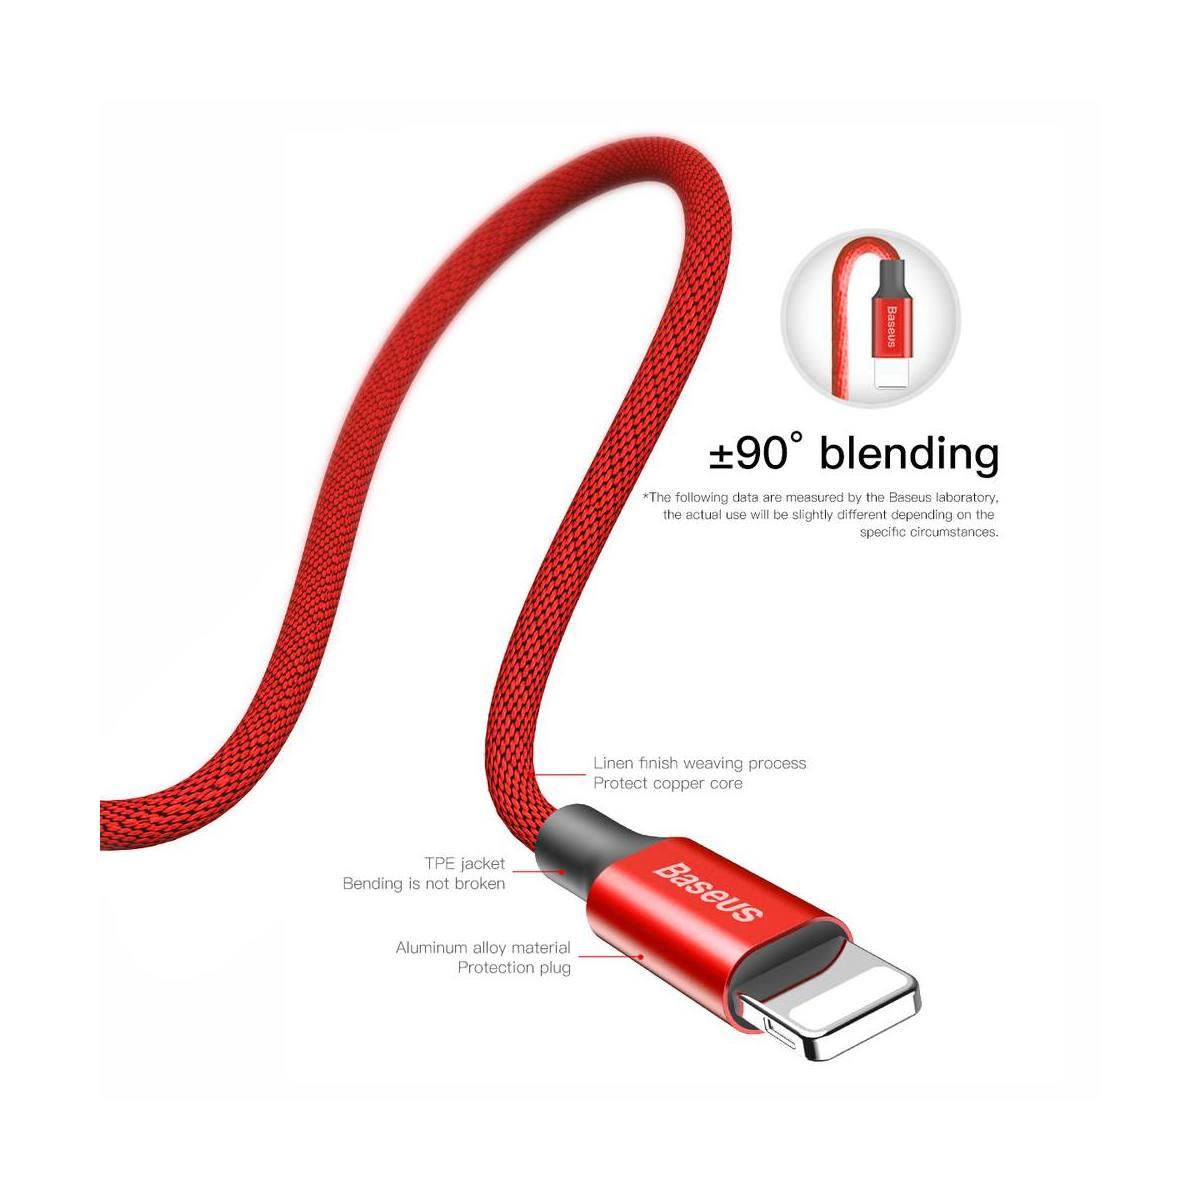 Baseus Lightning kábel, Yiven 1.5A, 3m, piros (CALYW-C09) LKUFPG